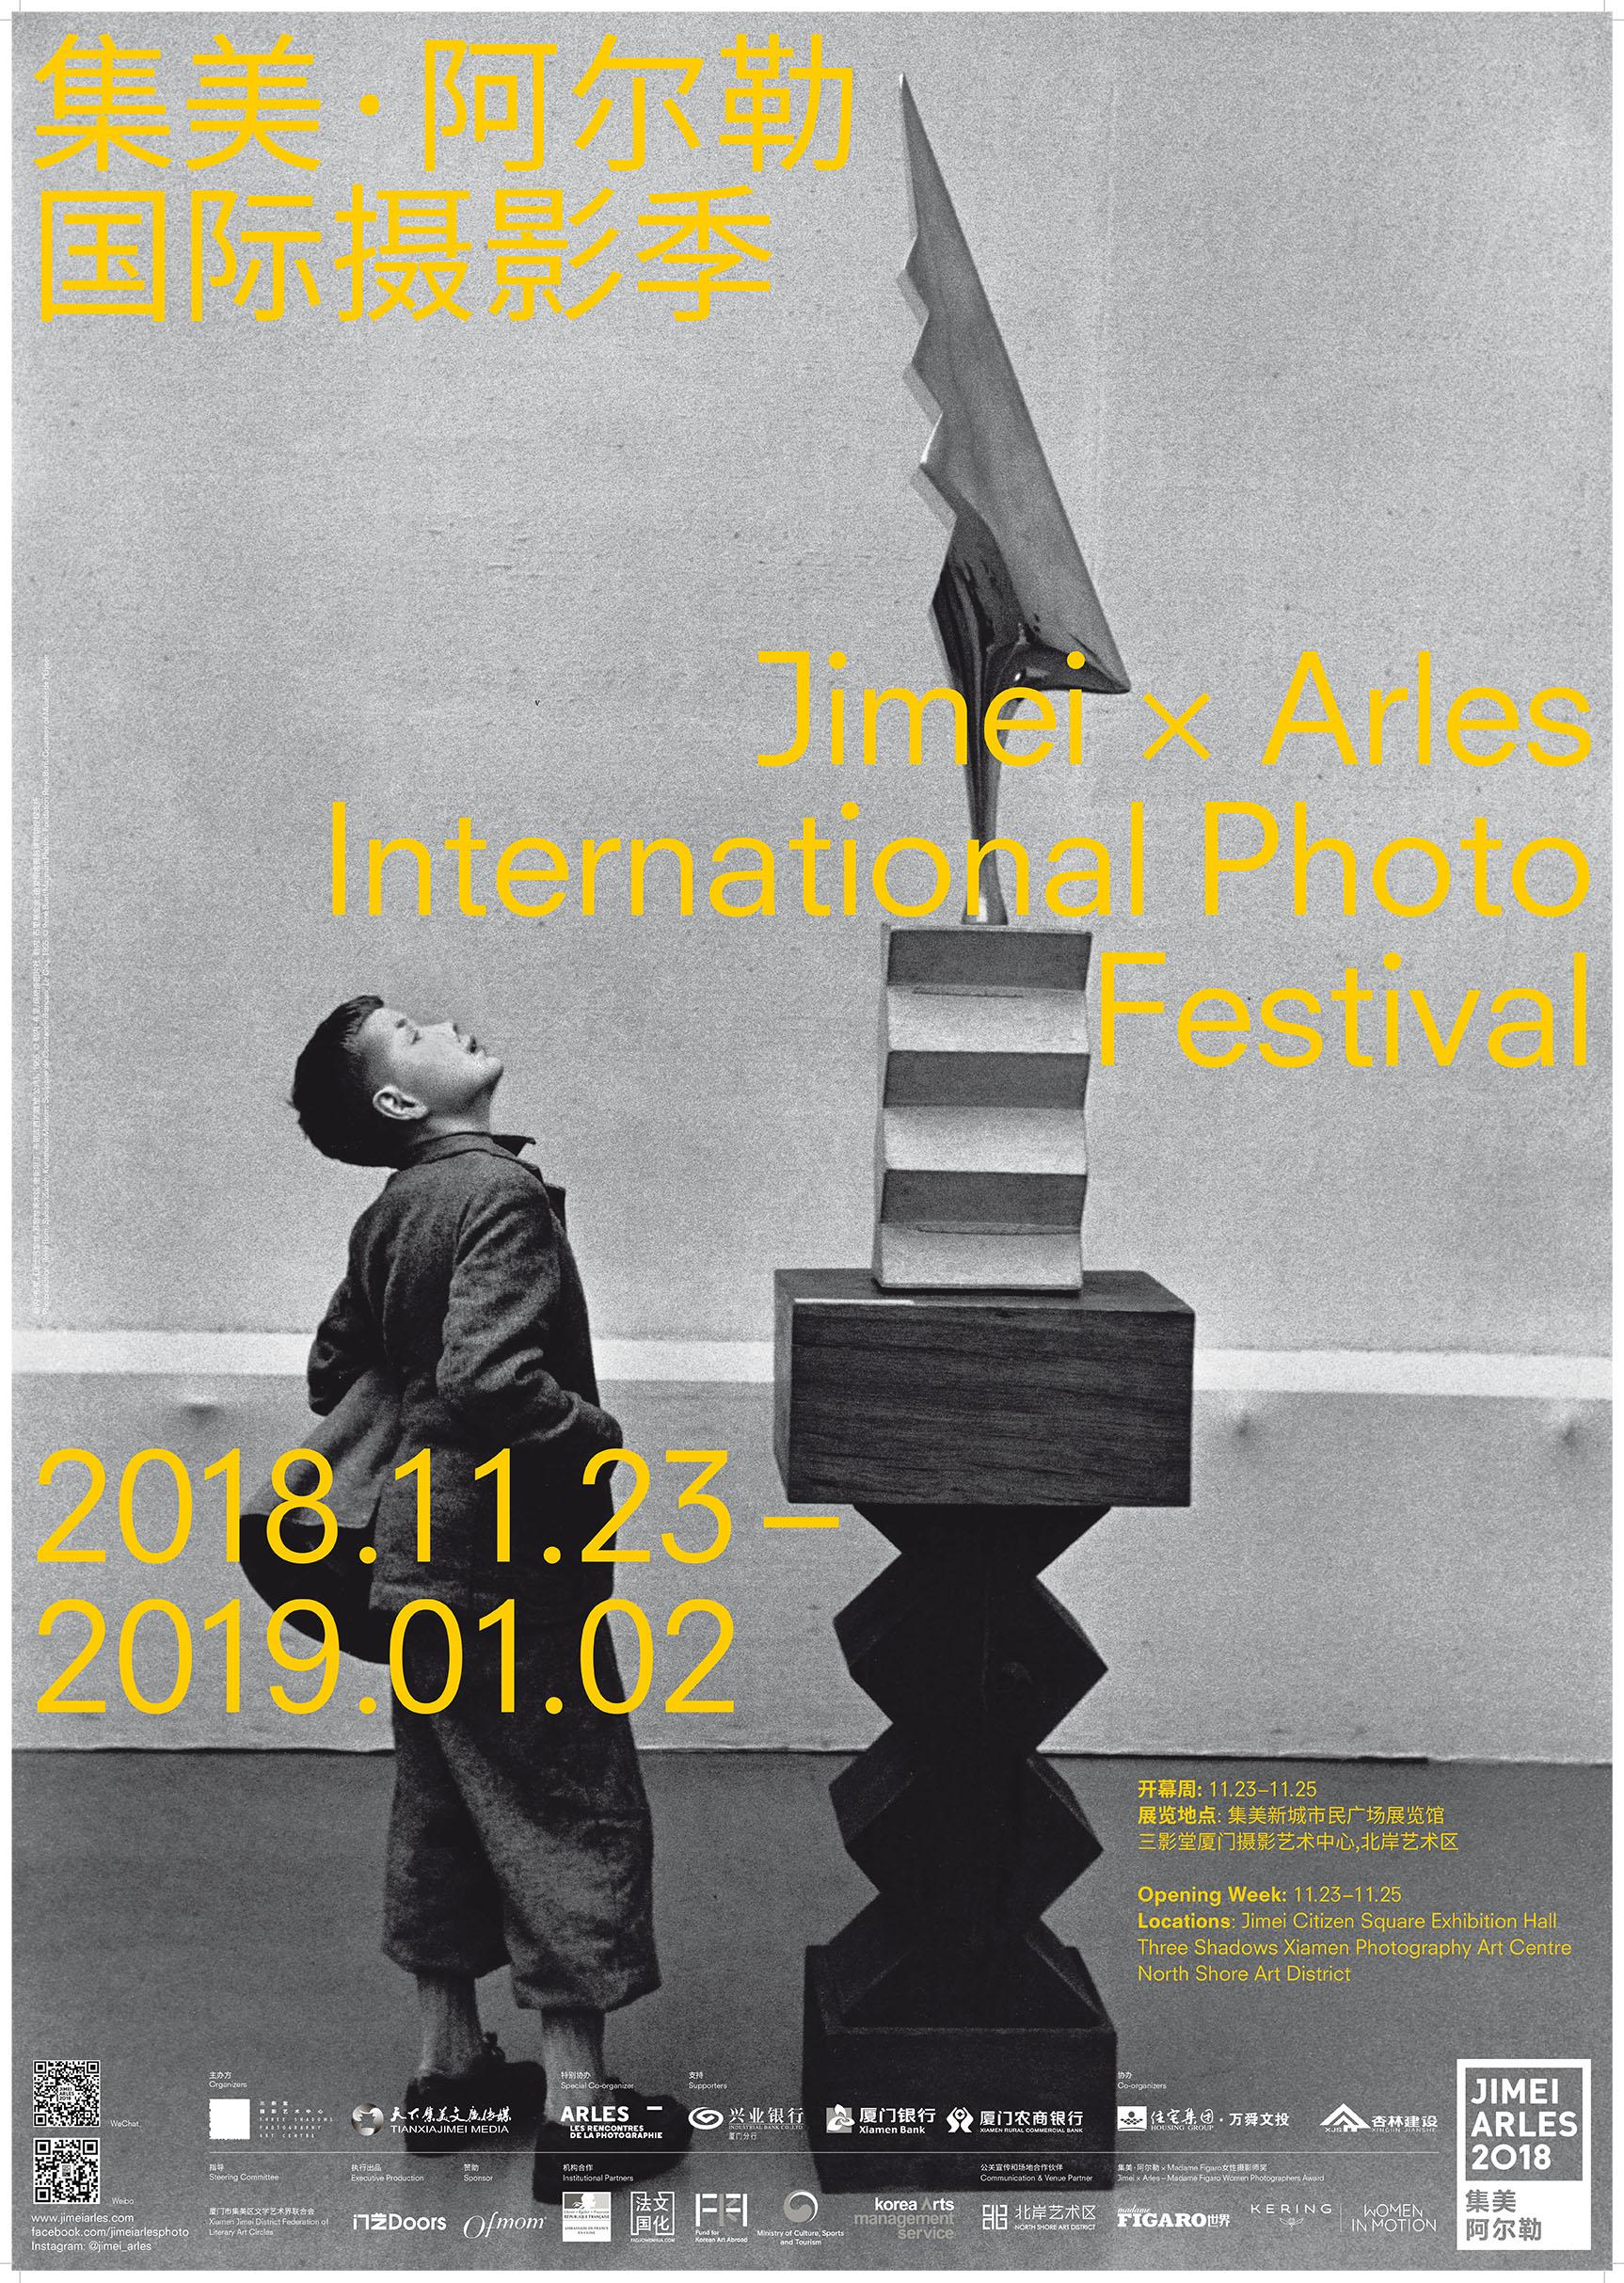 jimei-arles-2018-photography-of-china-1.jpg